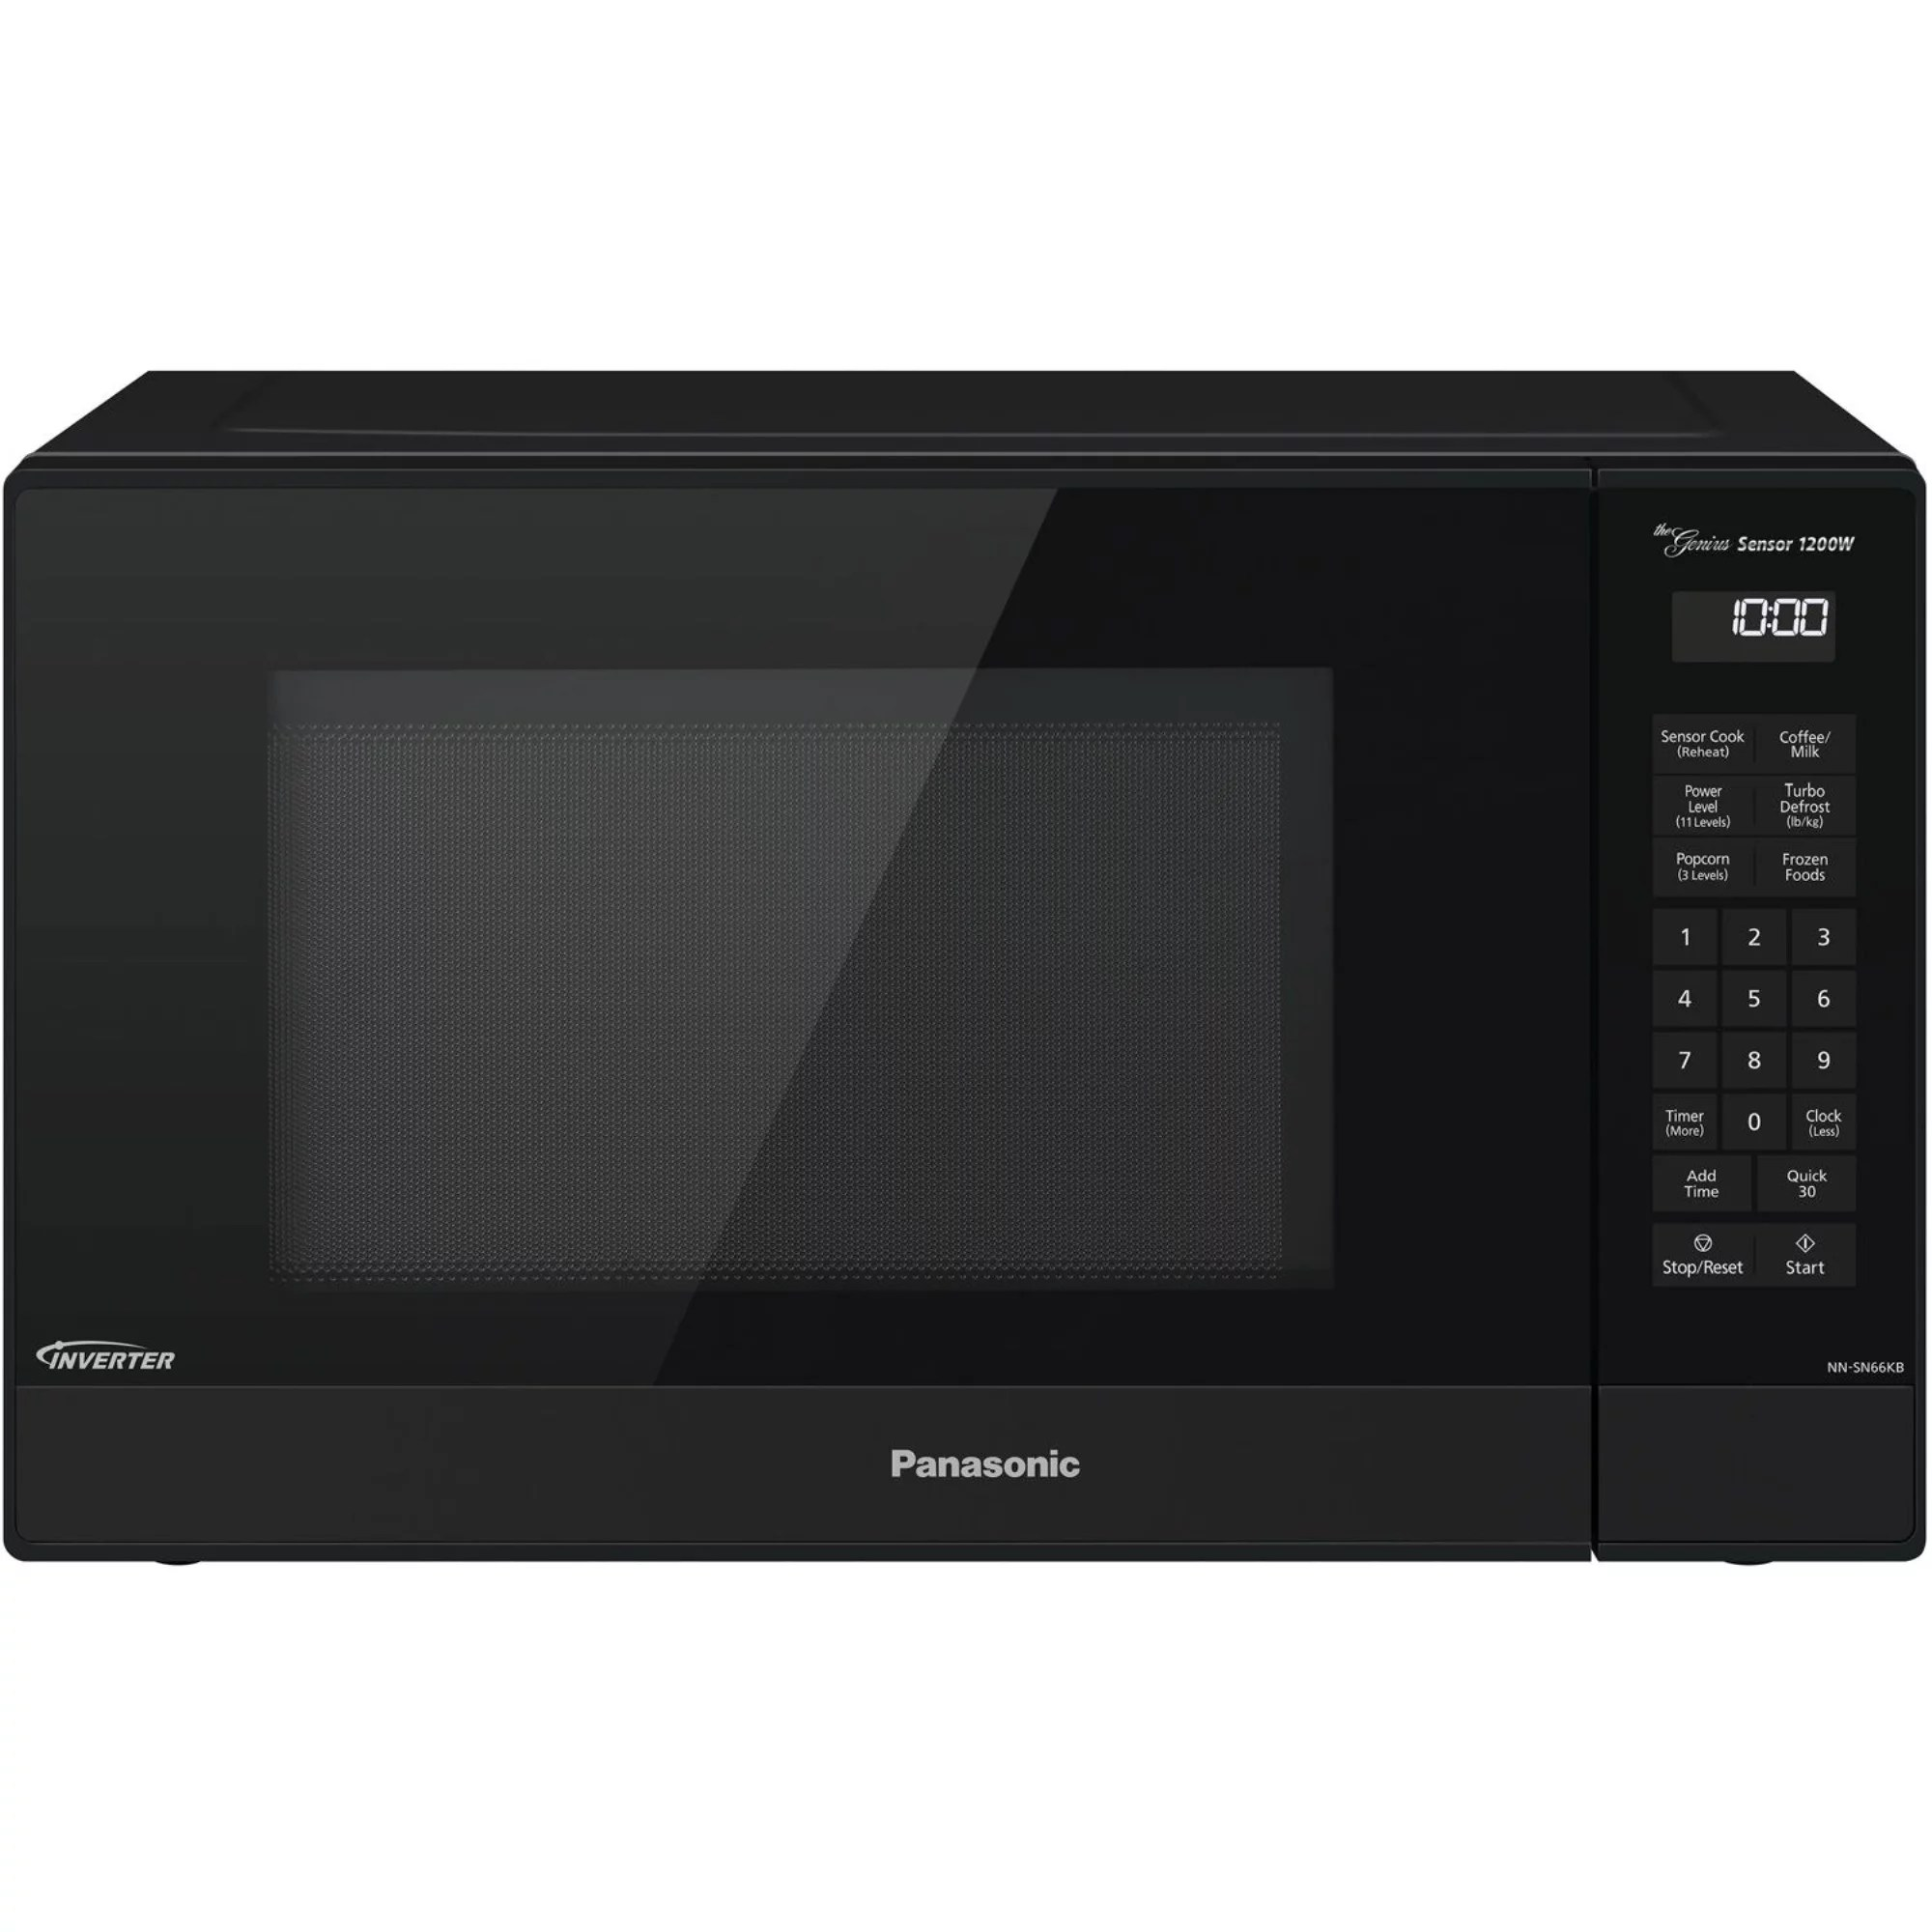 panasonic 1 2 cu ft 1200w genius sensor countertop microwave oven with inverter technology in black